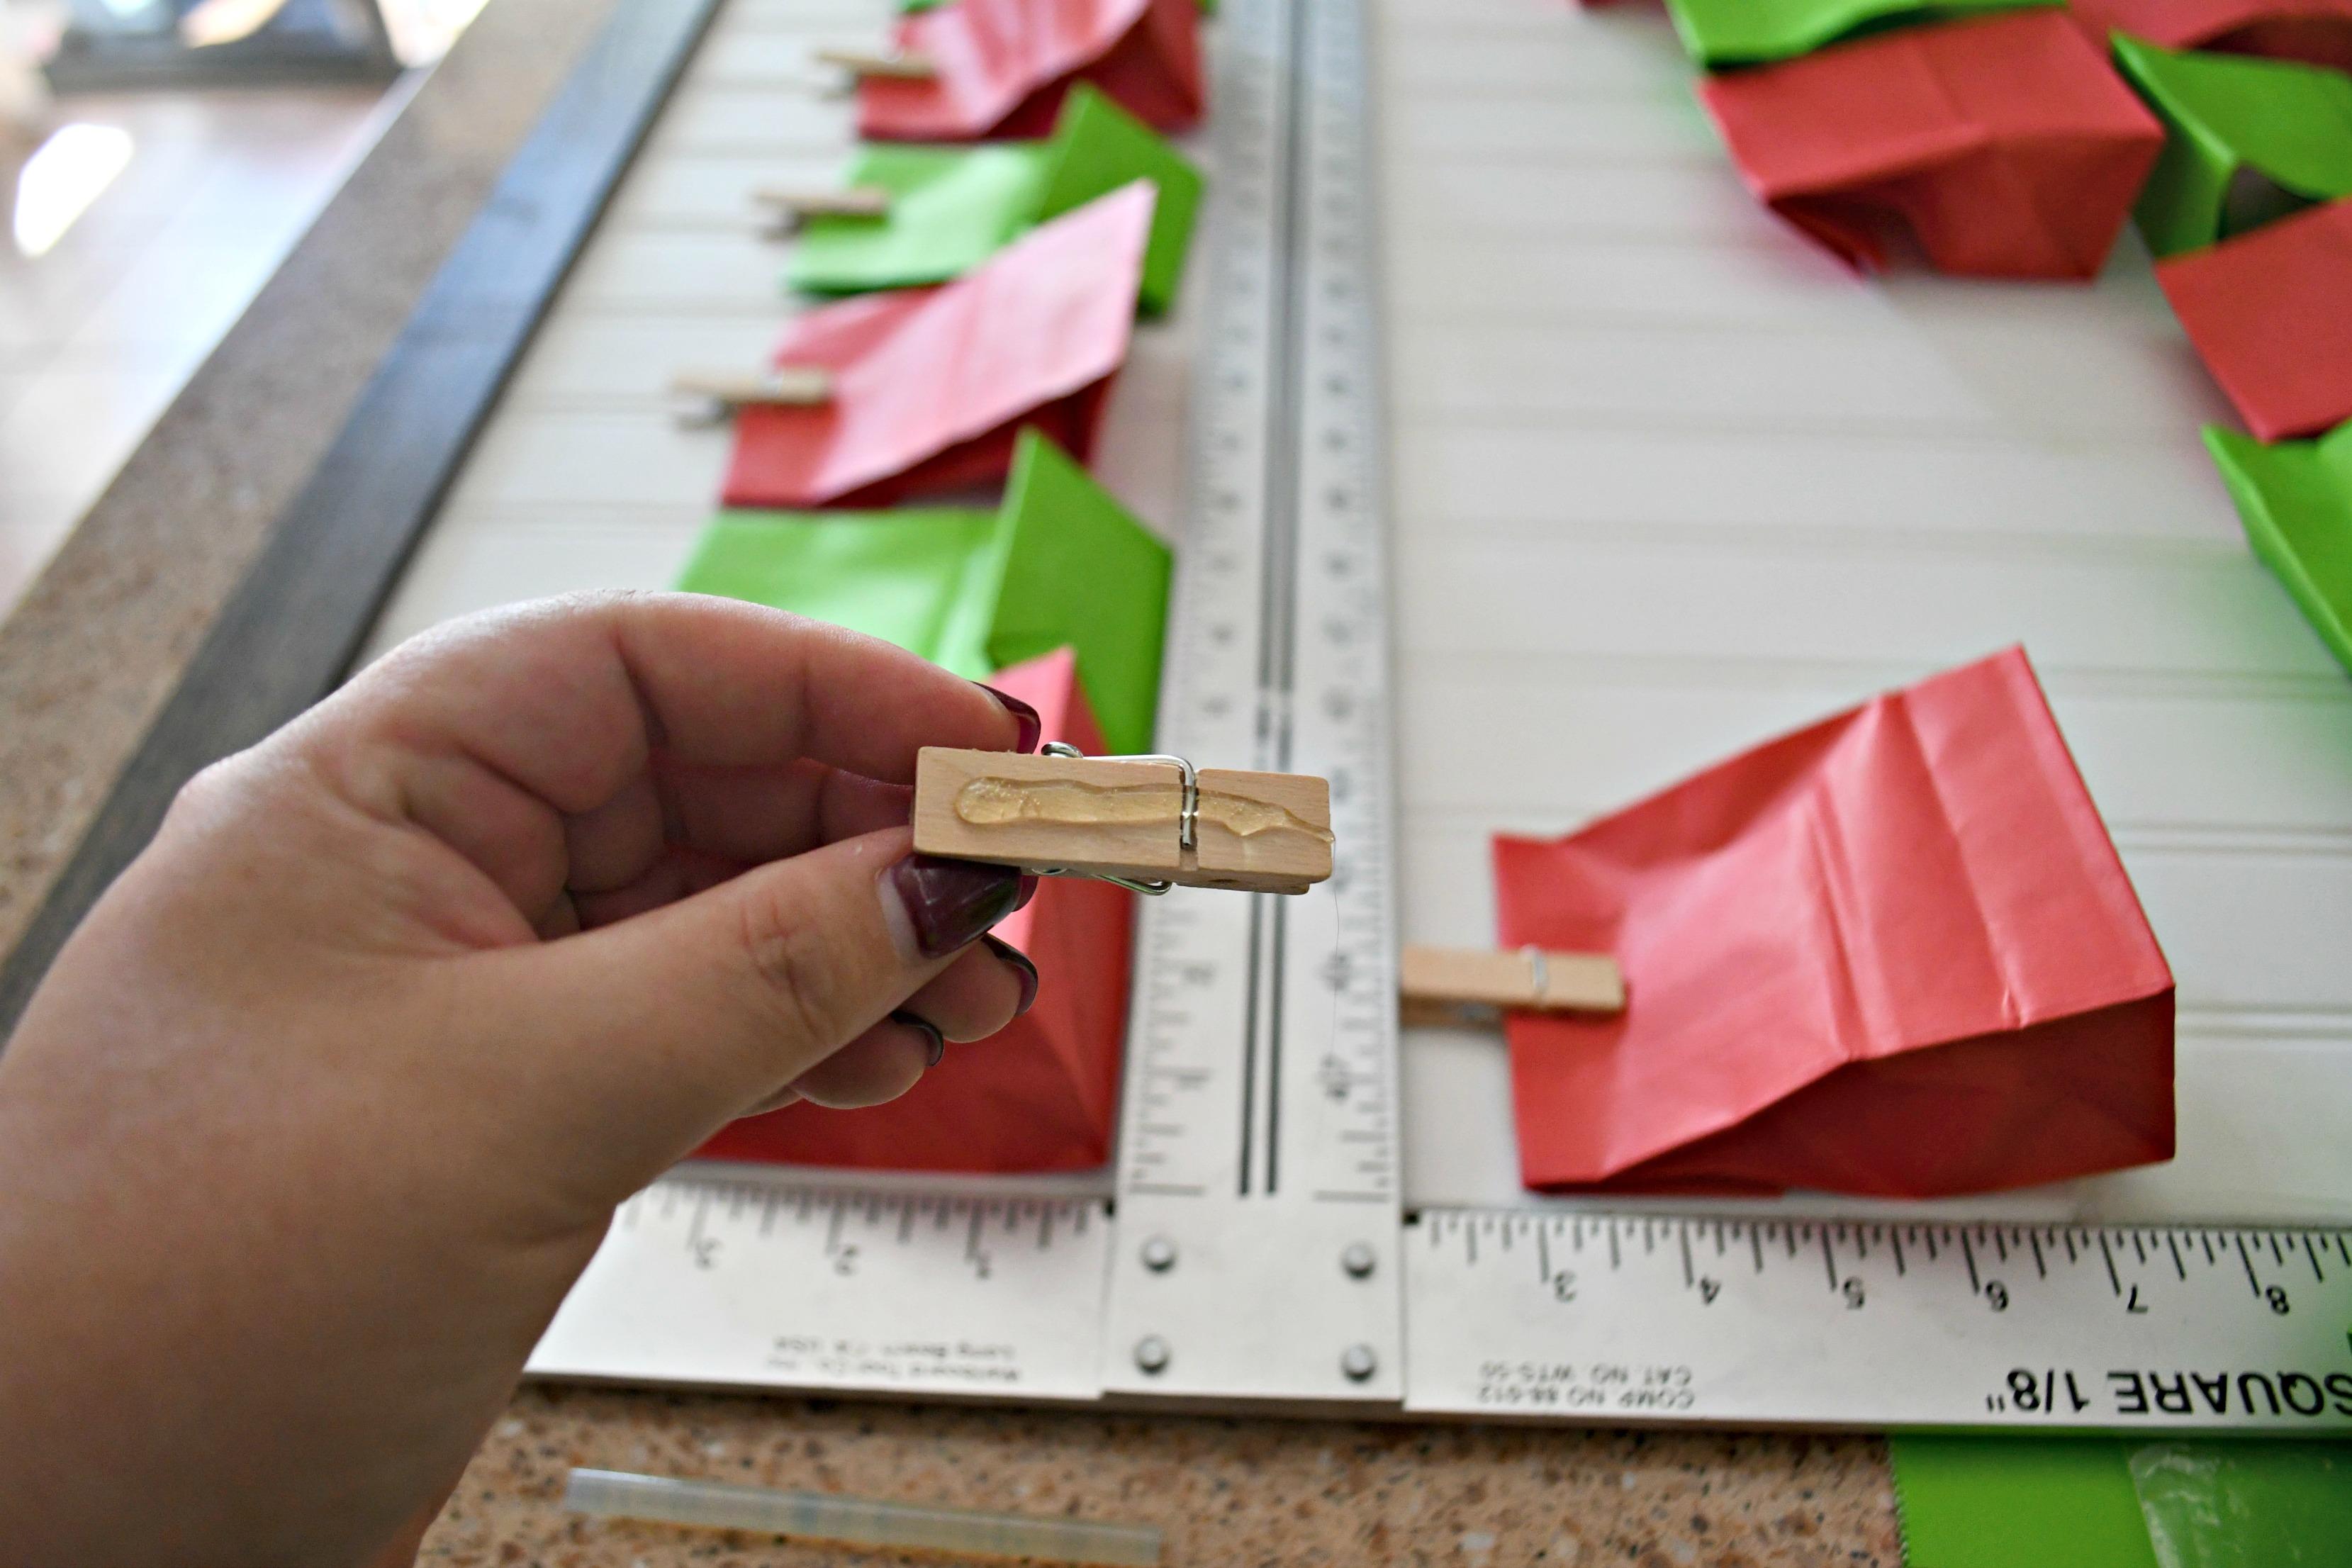 DIY Hanging Treat Bag Advent Calendar